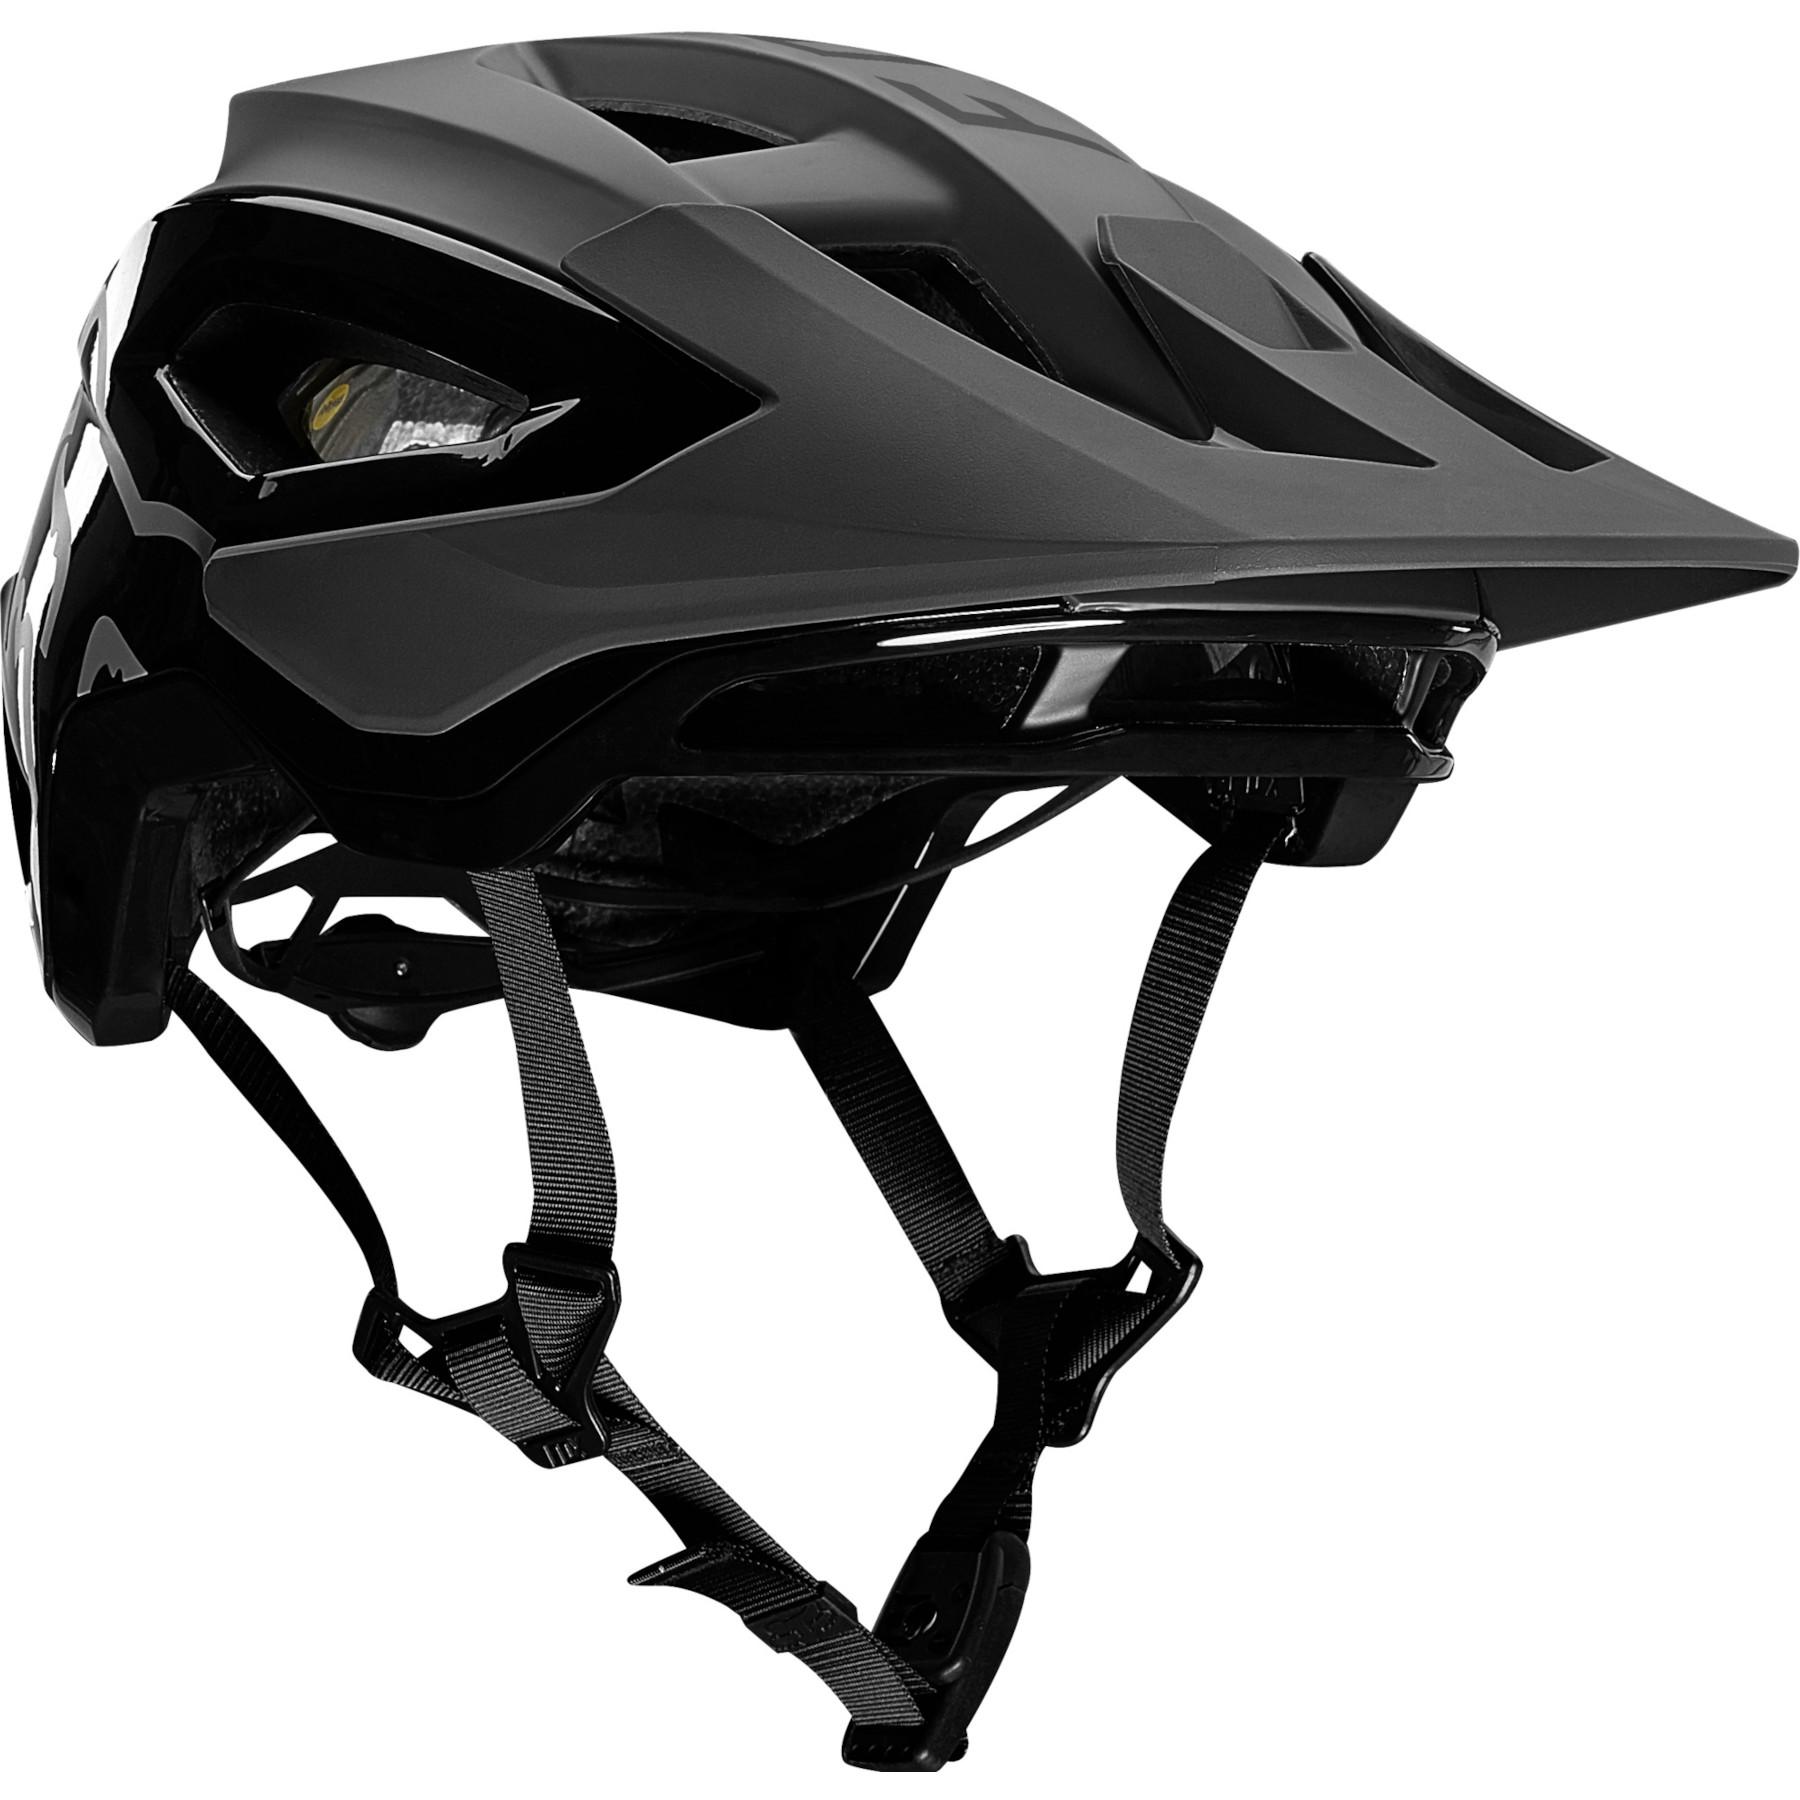 FOX Speedframe Pro MTB MIPS Helmet - black